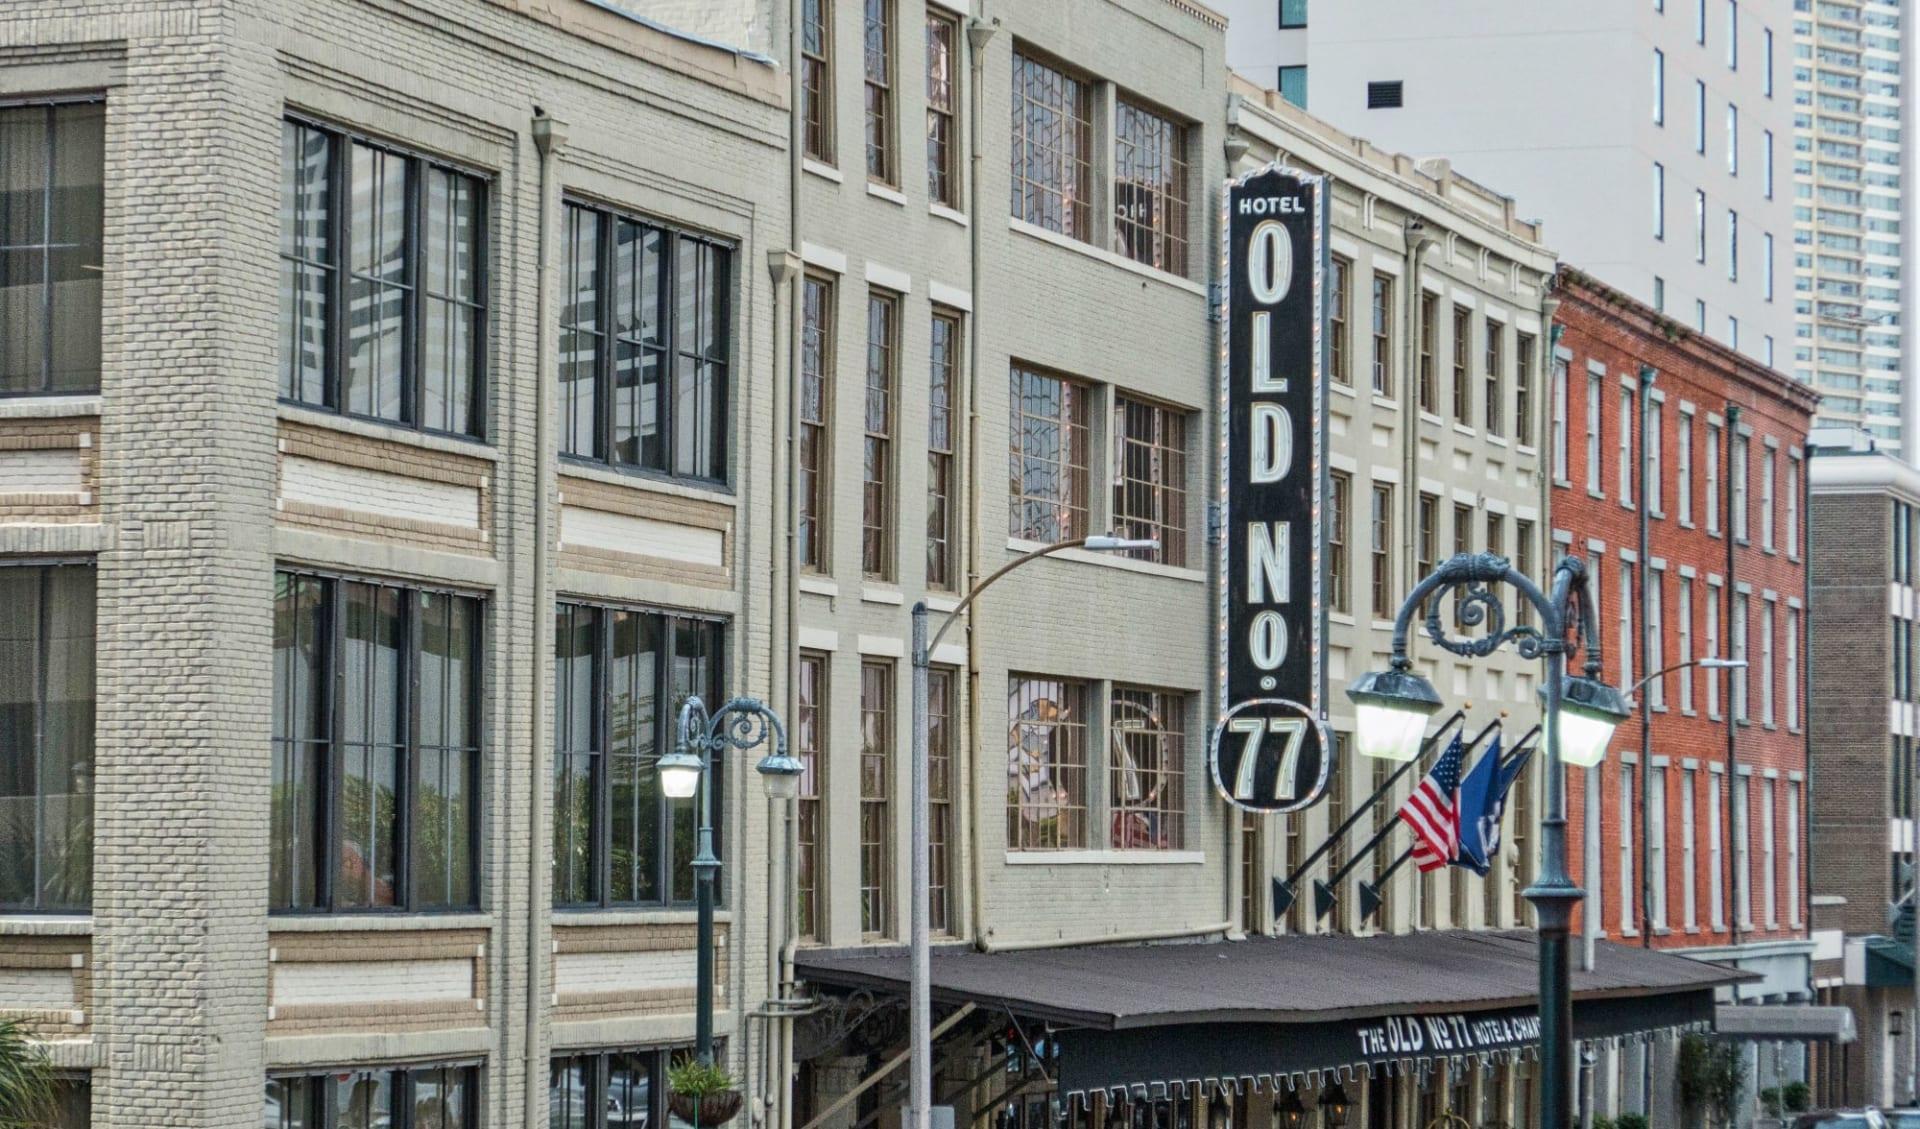 Old No. 77 Hotel & Chandlery in New Orleans:  Old No. 77 - Aussenansicht